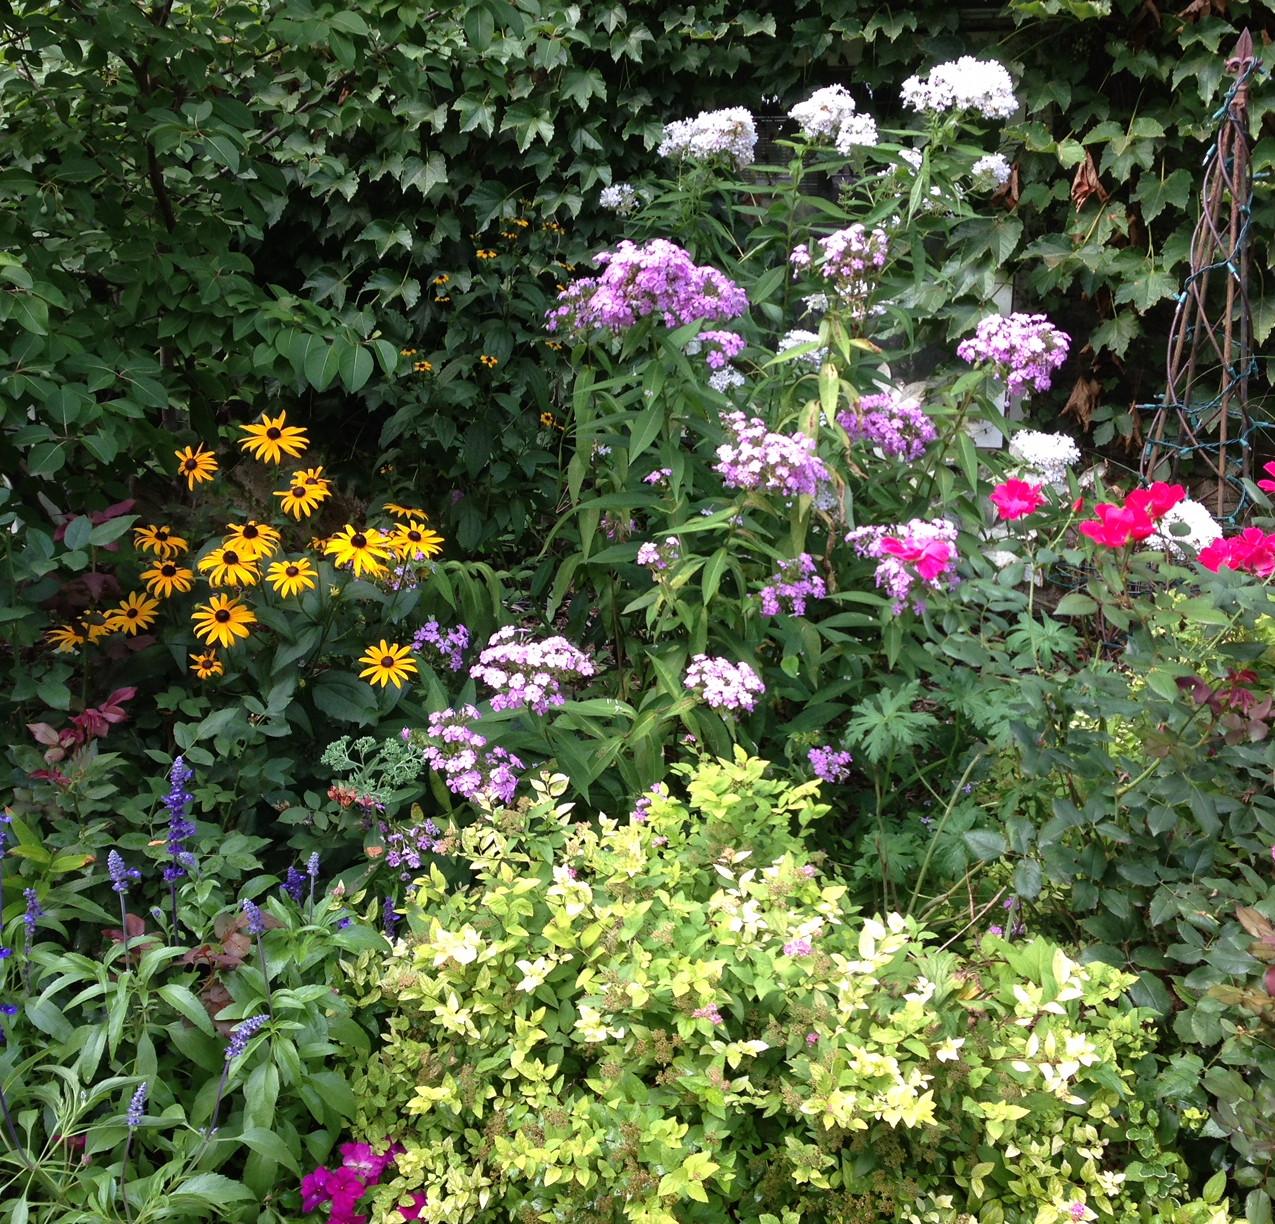 Colorful perennials